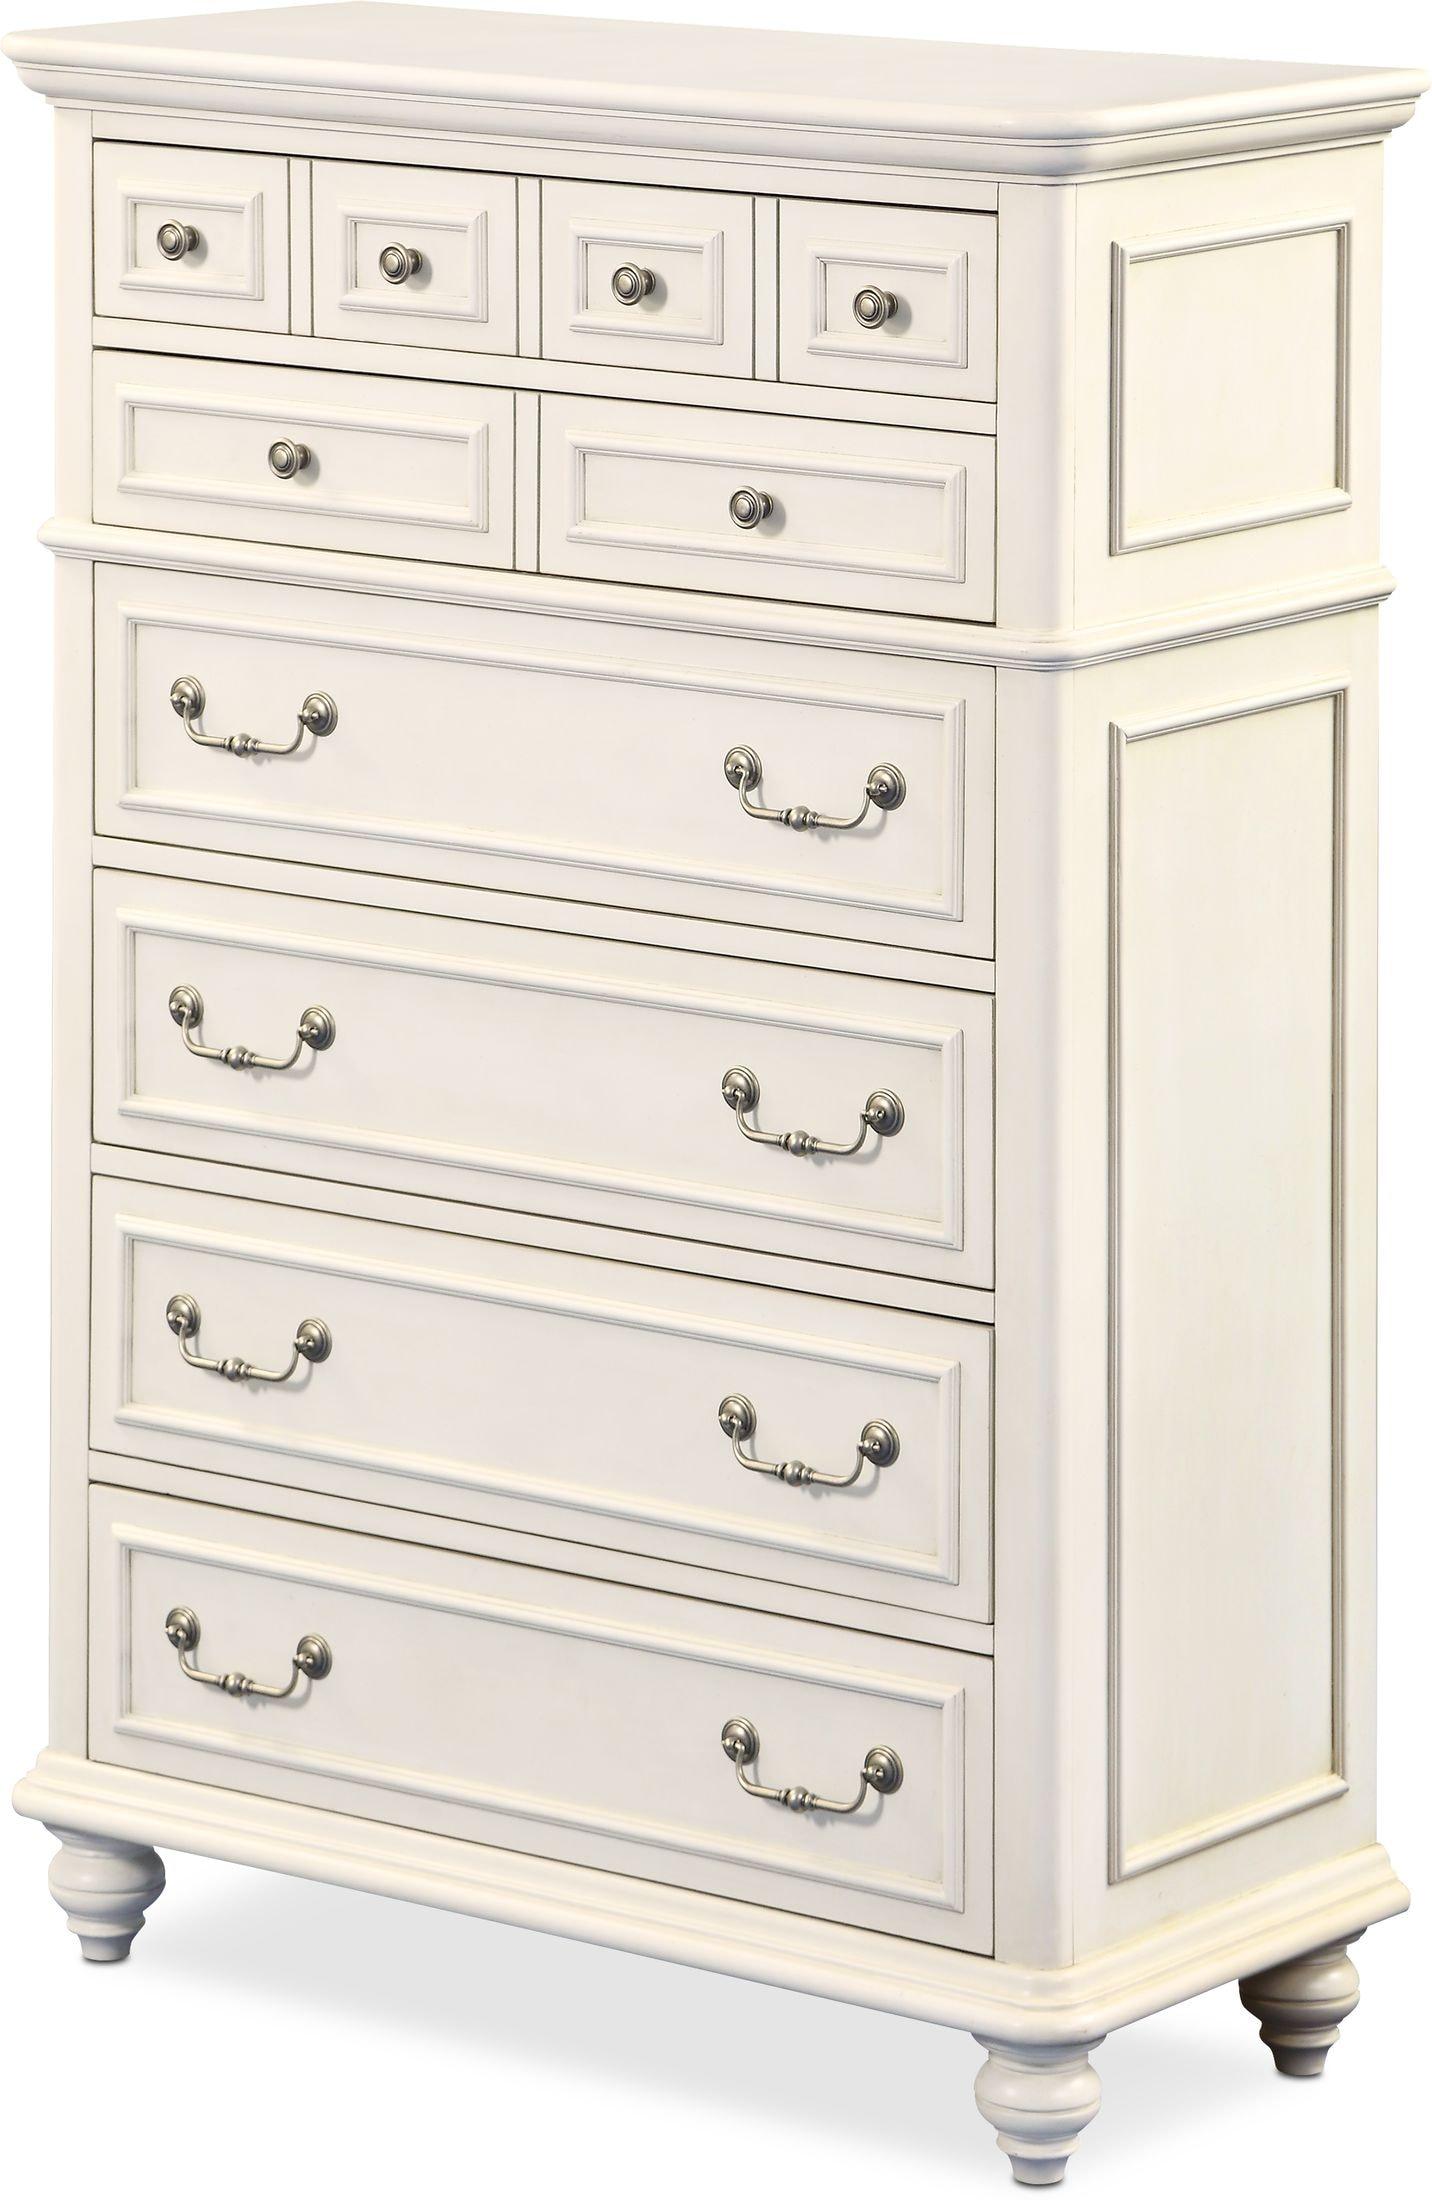 Bedroom Furniture - Charleston Chest